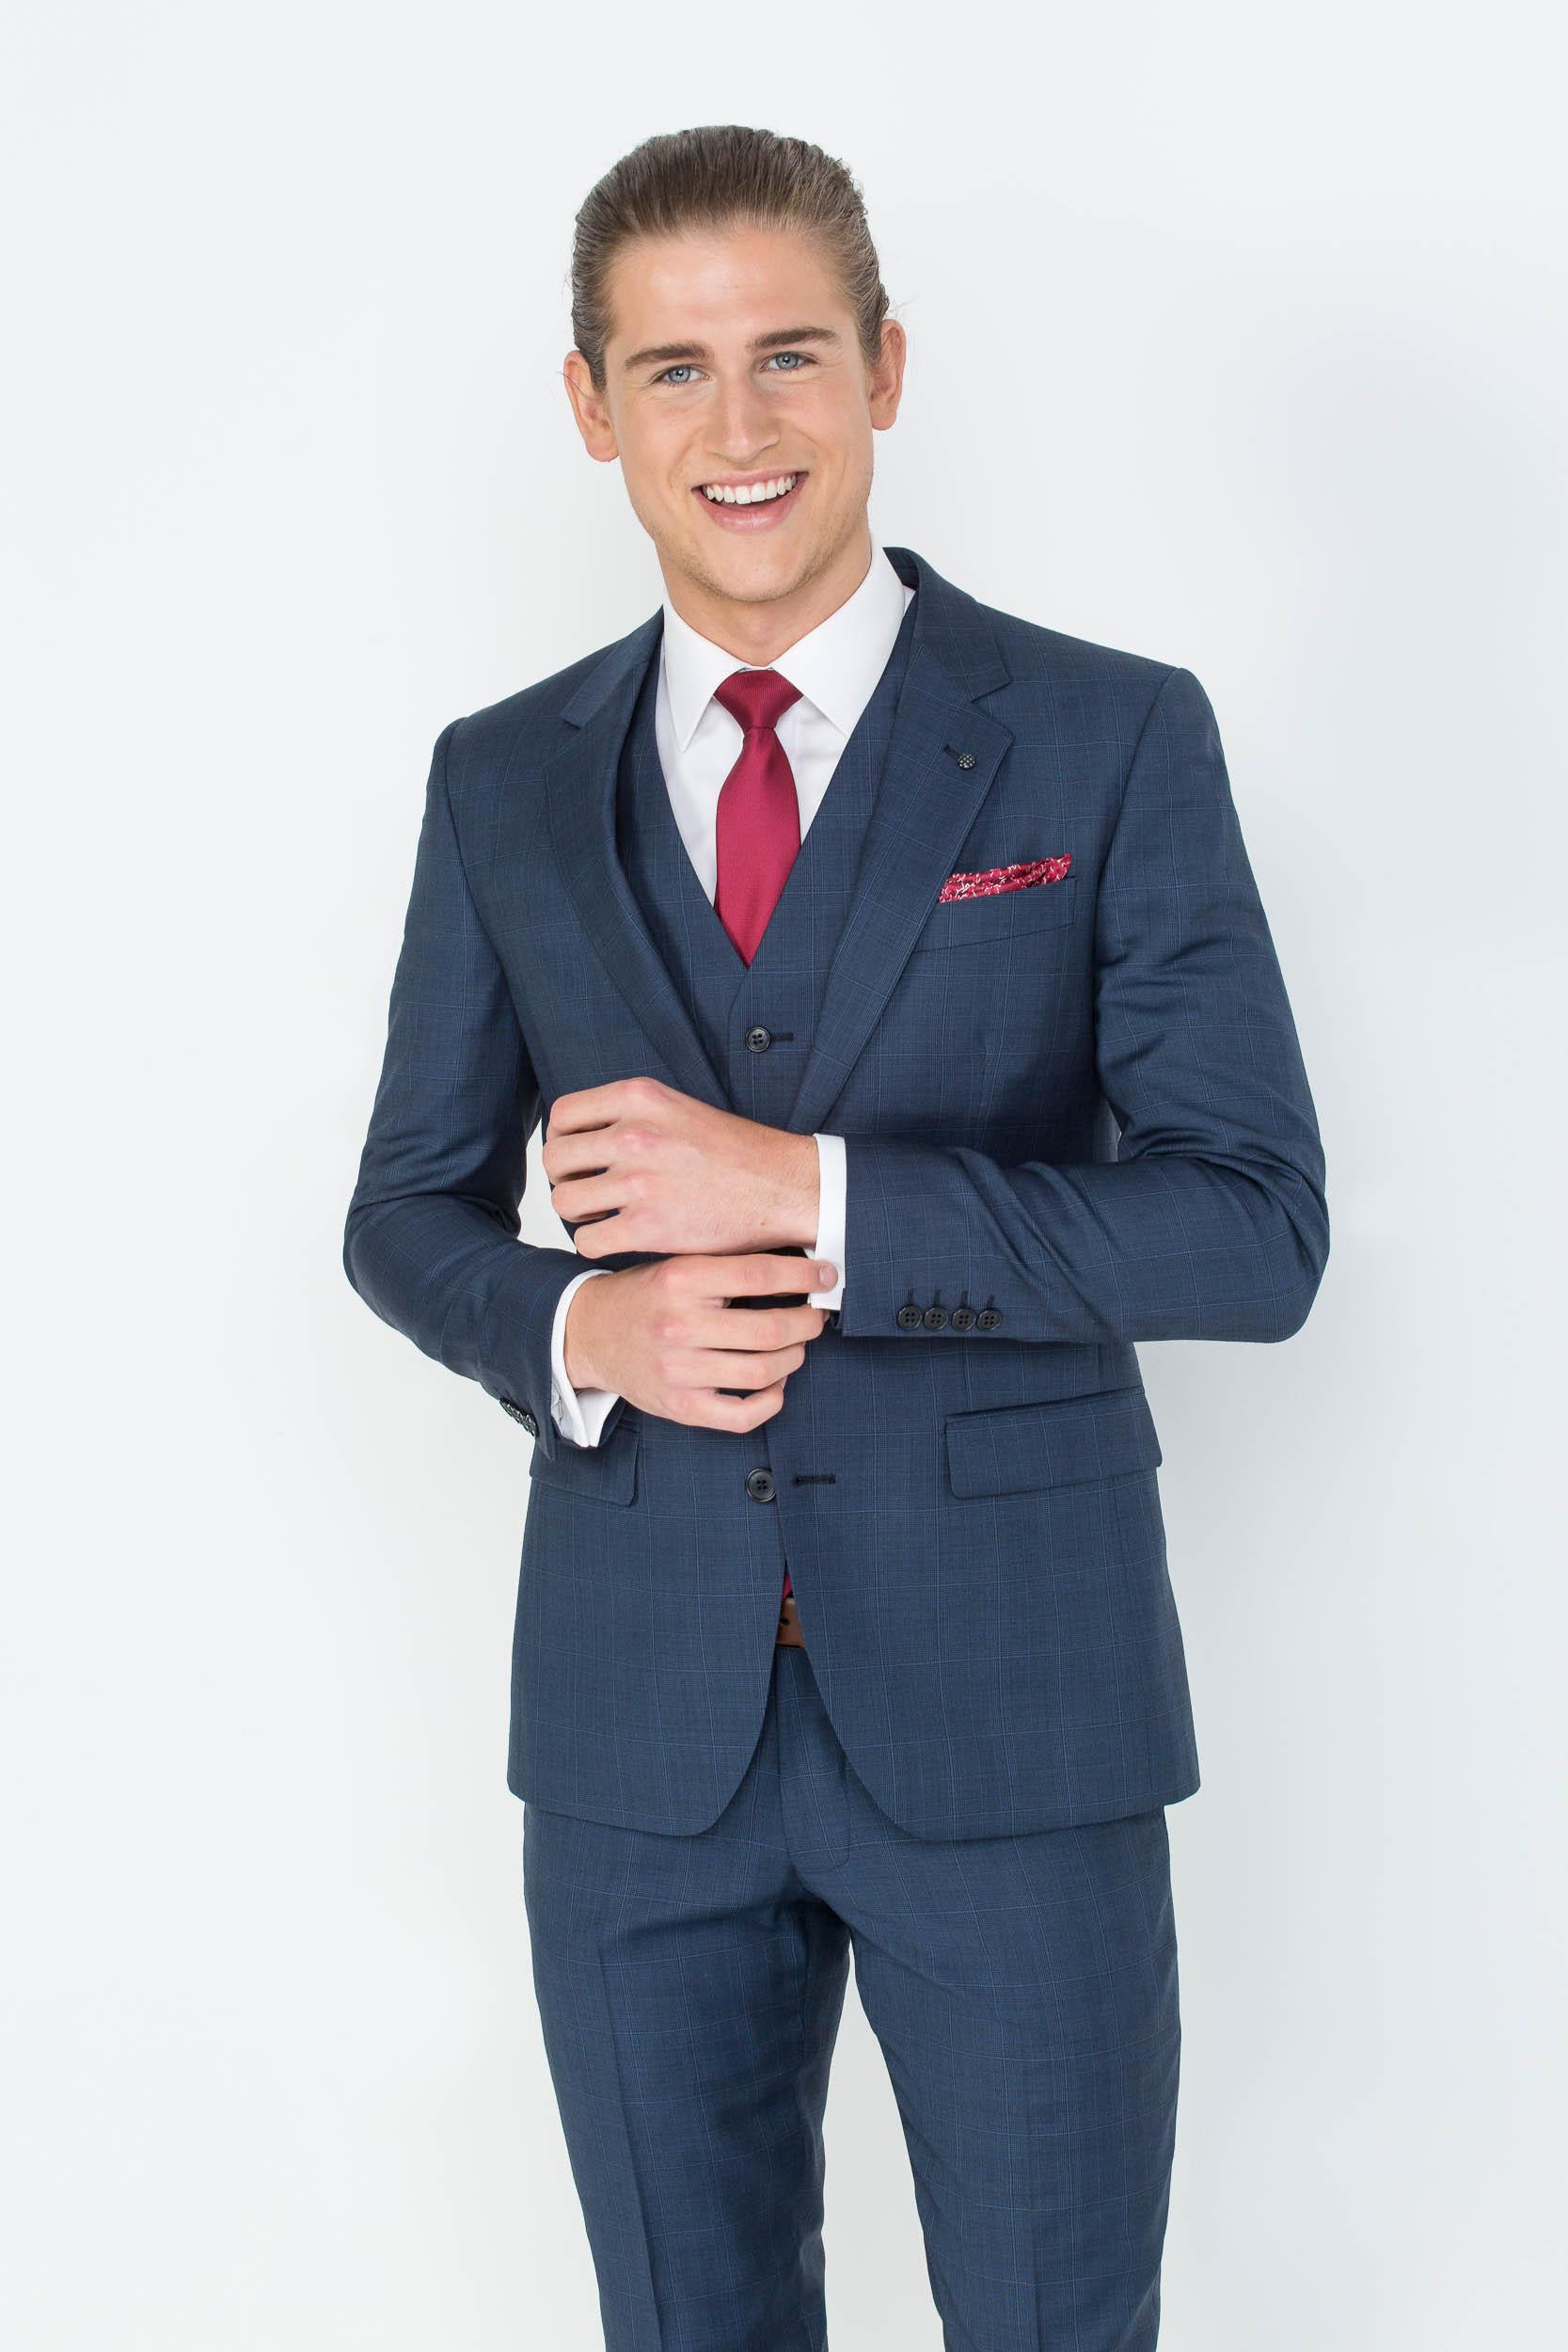 Commercial Mens Fashion Photography by Nick Walters for Ferrari Formalwear6.jpg